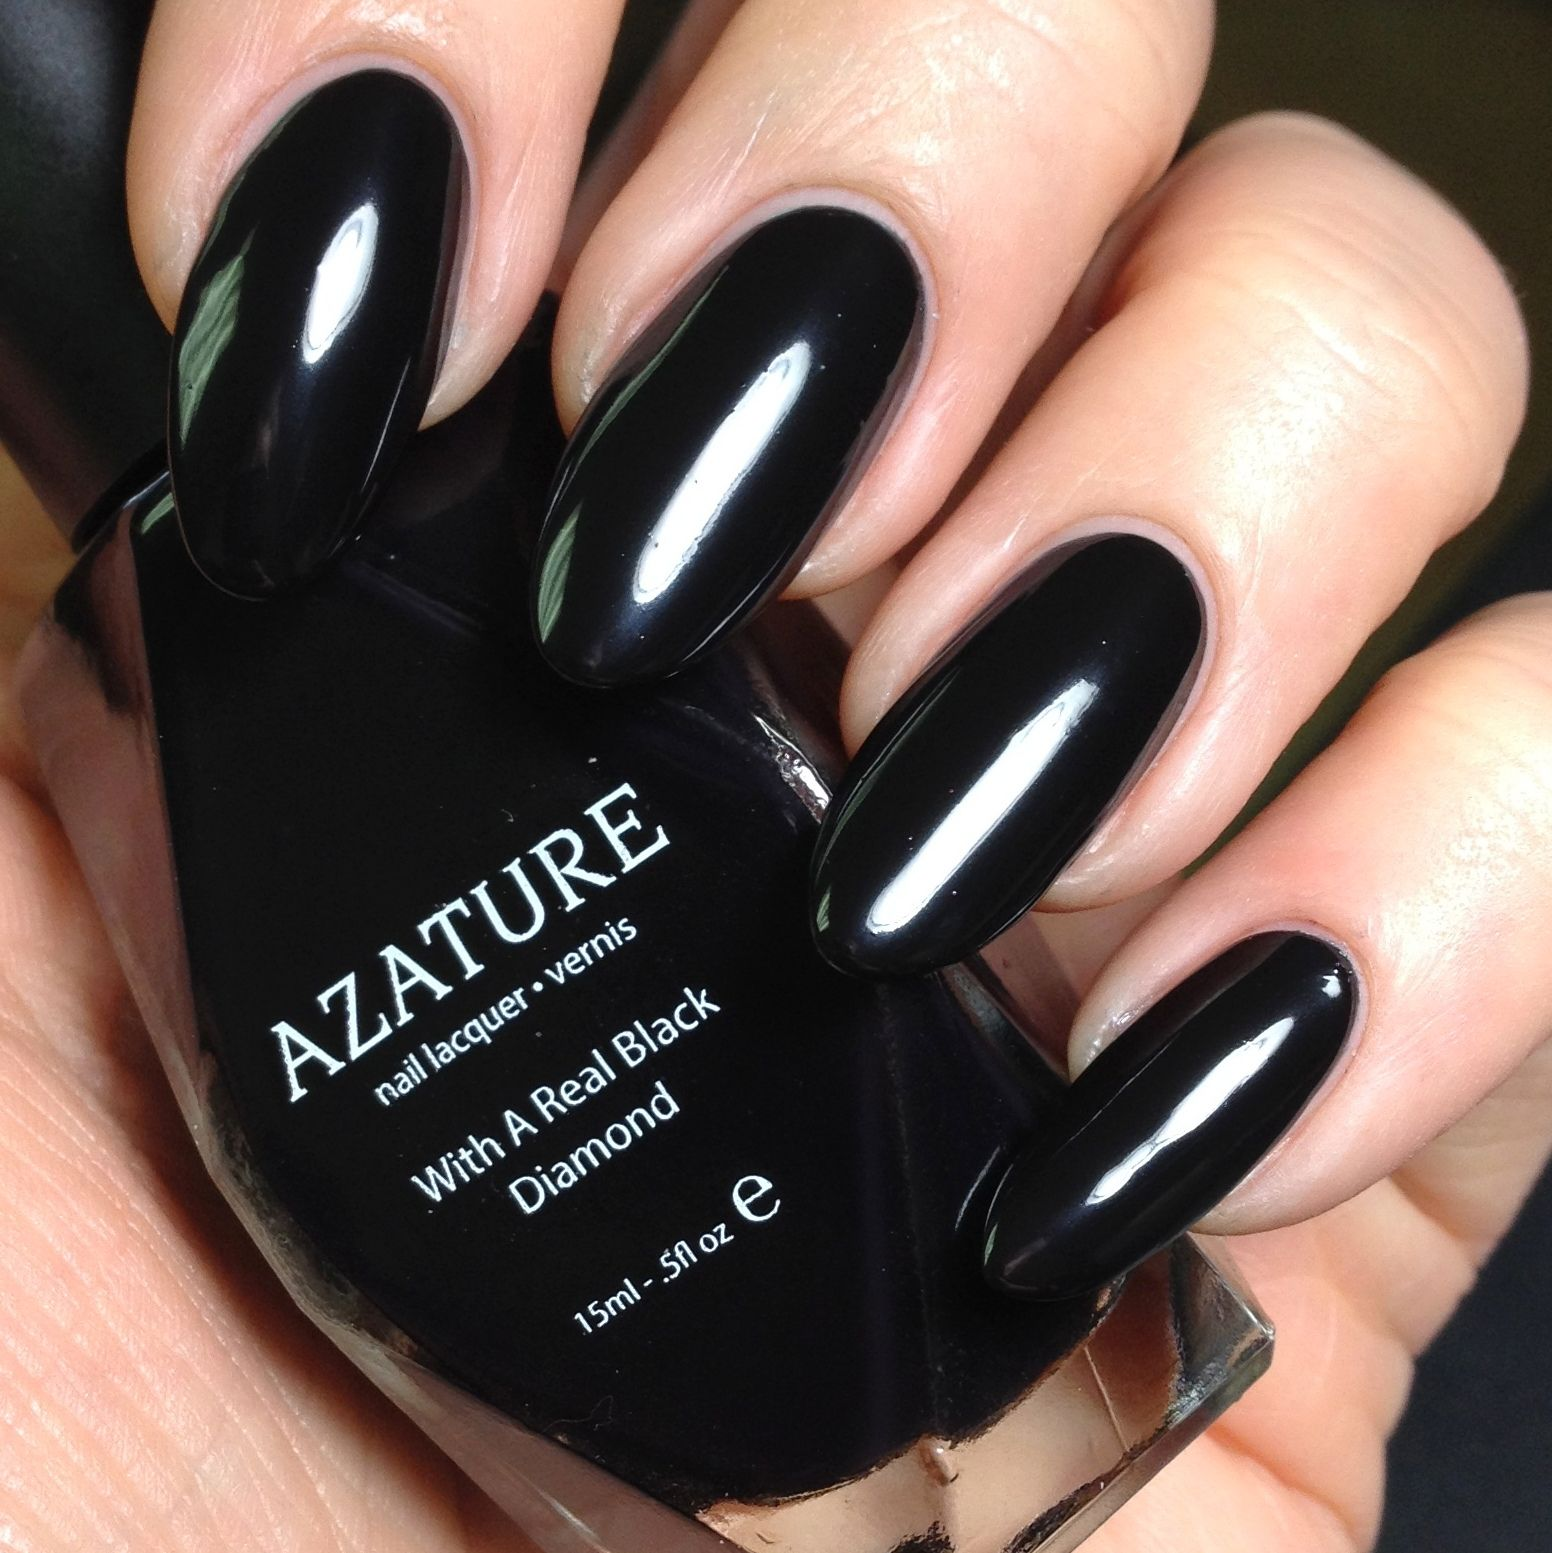 Azature black diamond nail polish in Midnight Diamond. The entire 40 ...